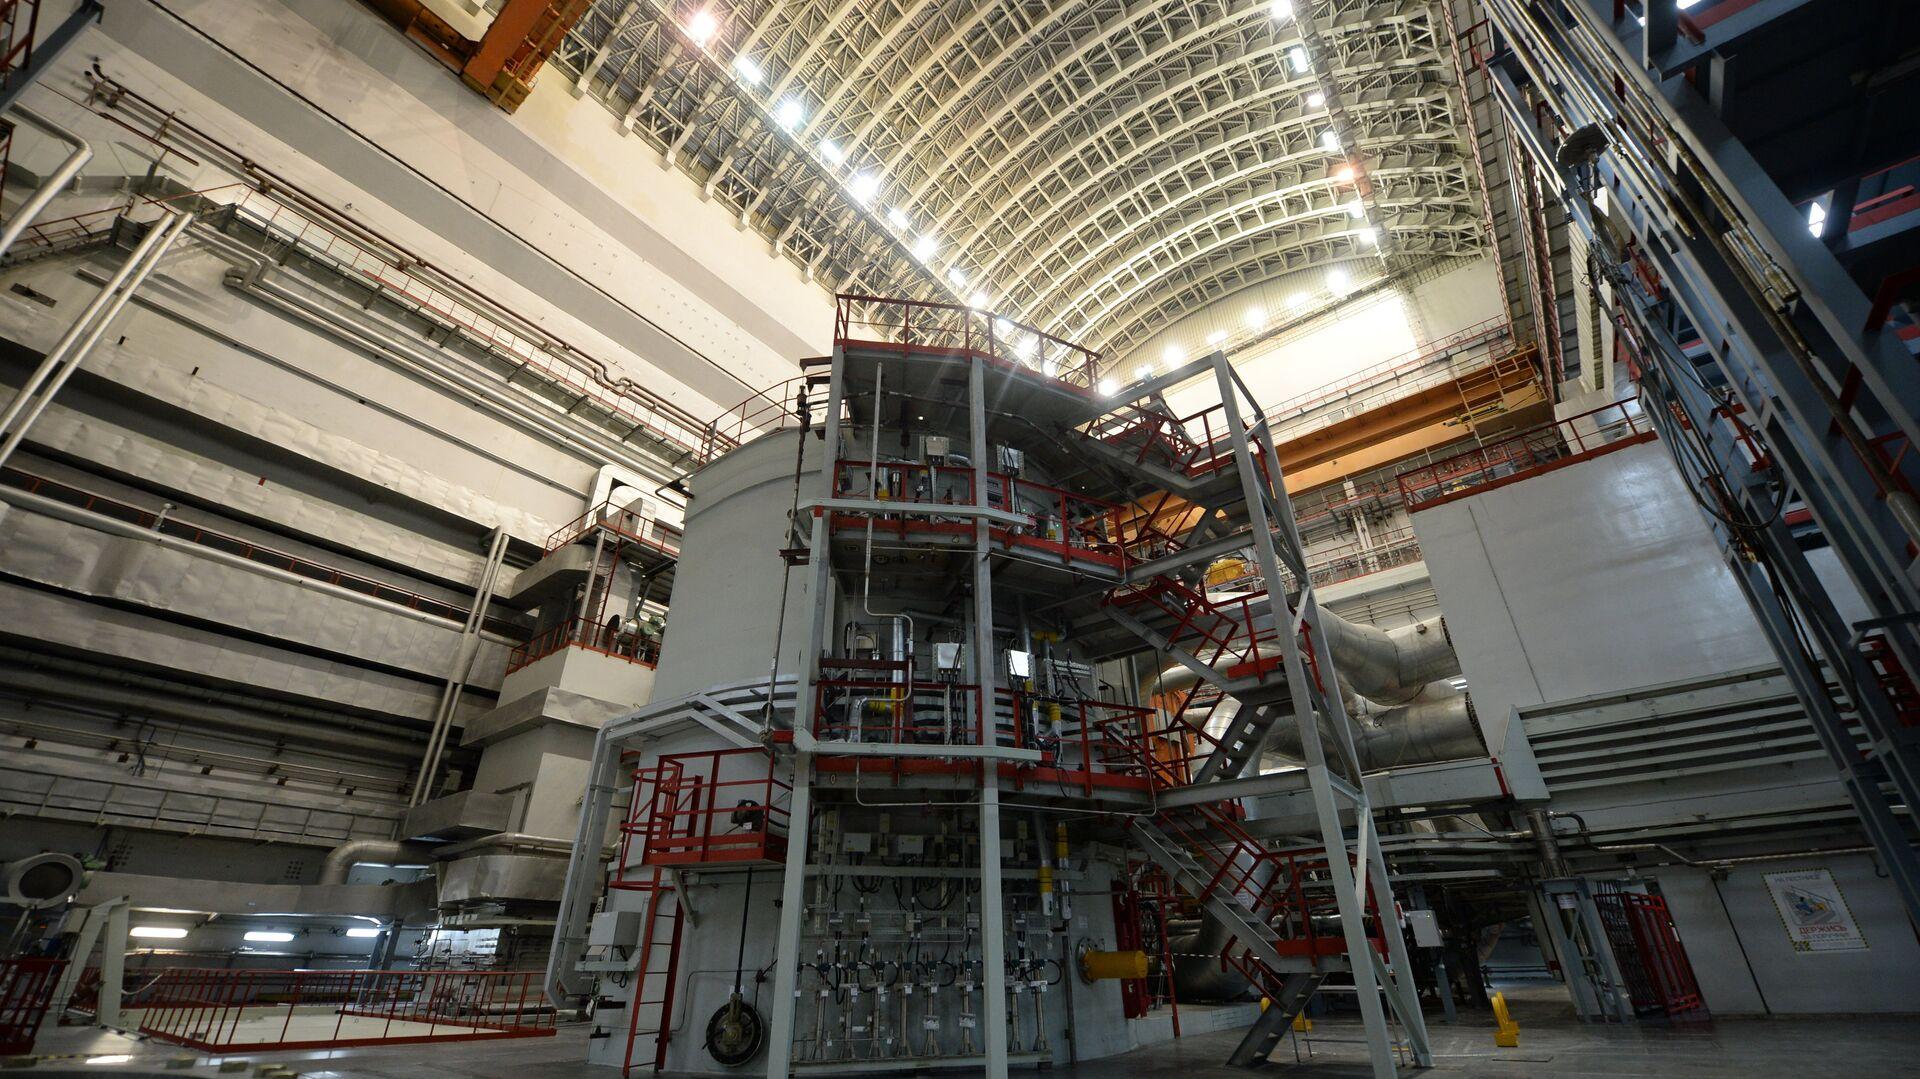 Una planta nuclear (imagen referencial) - Sputnik Mundo, 1920, 16.06.2021